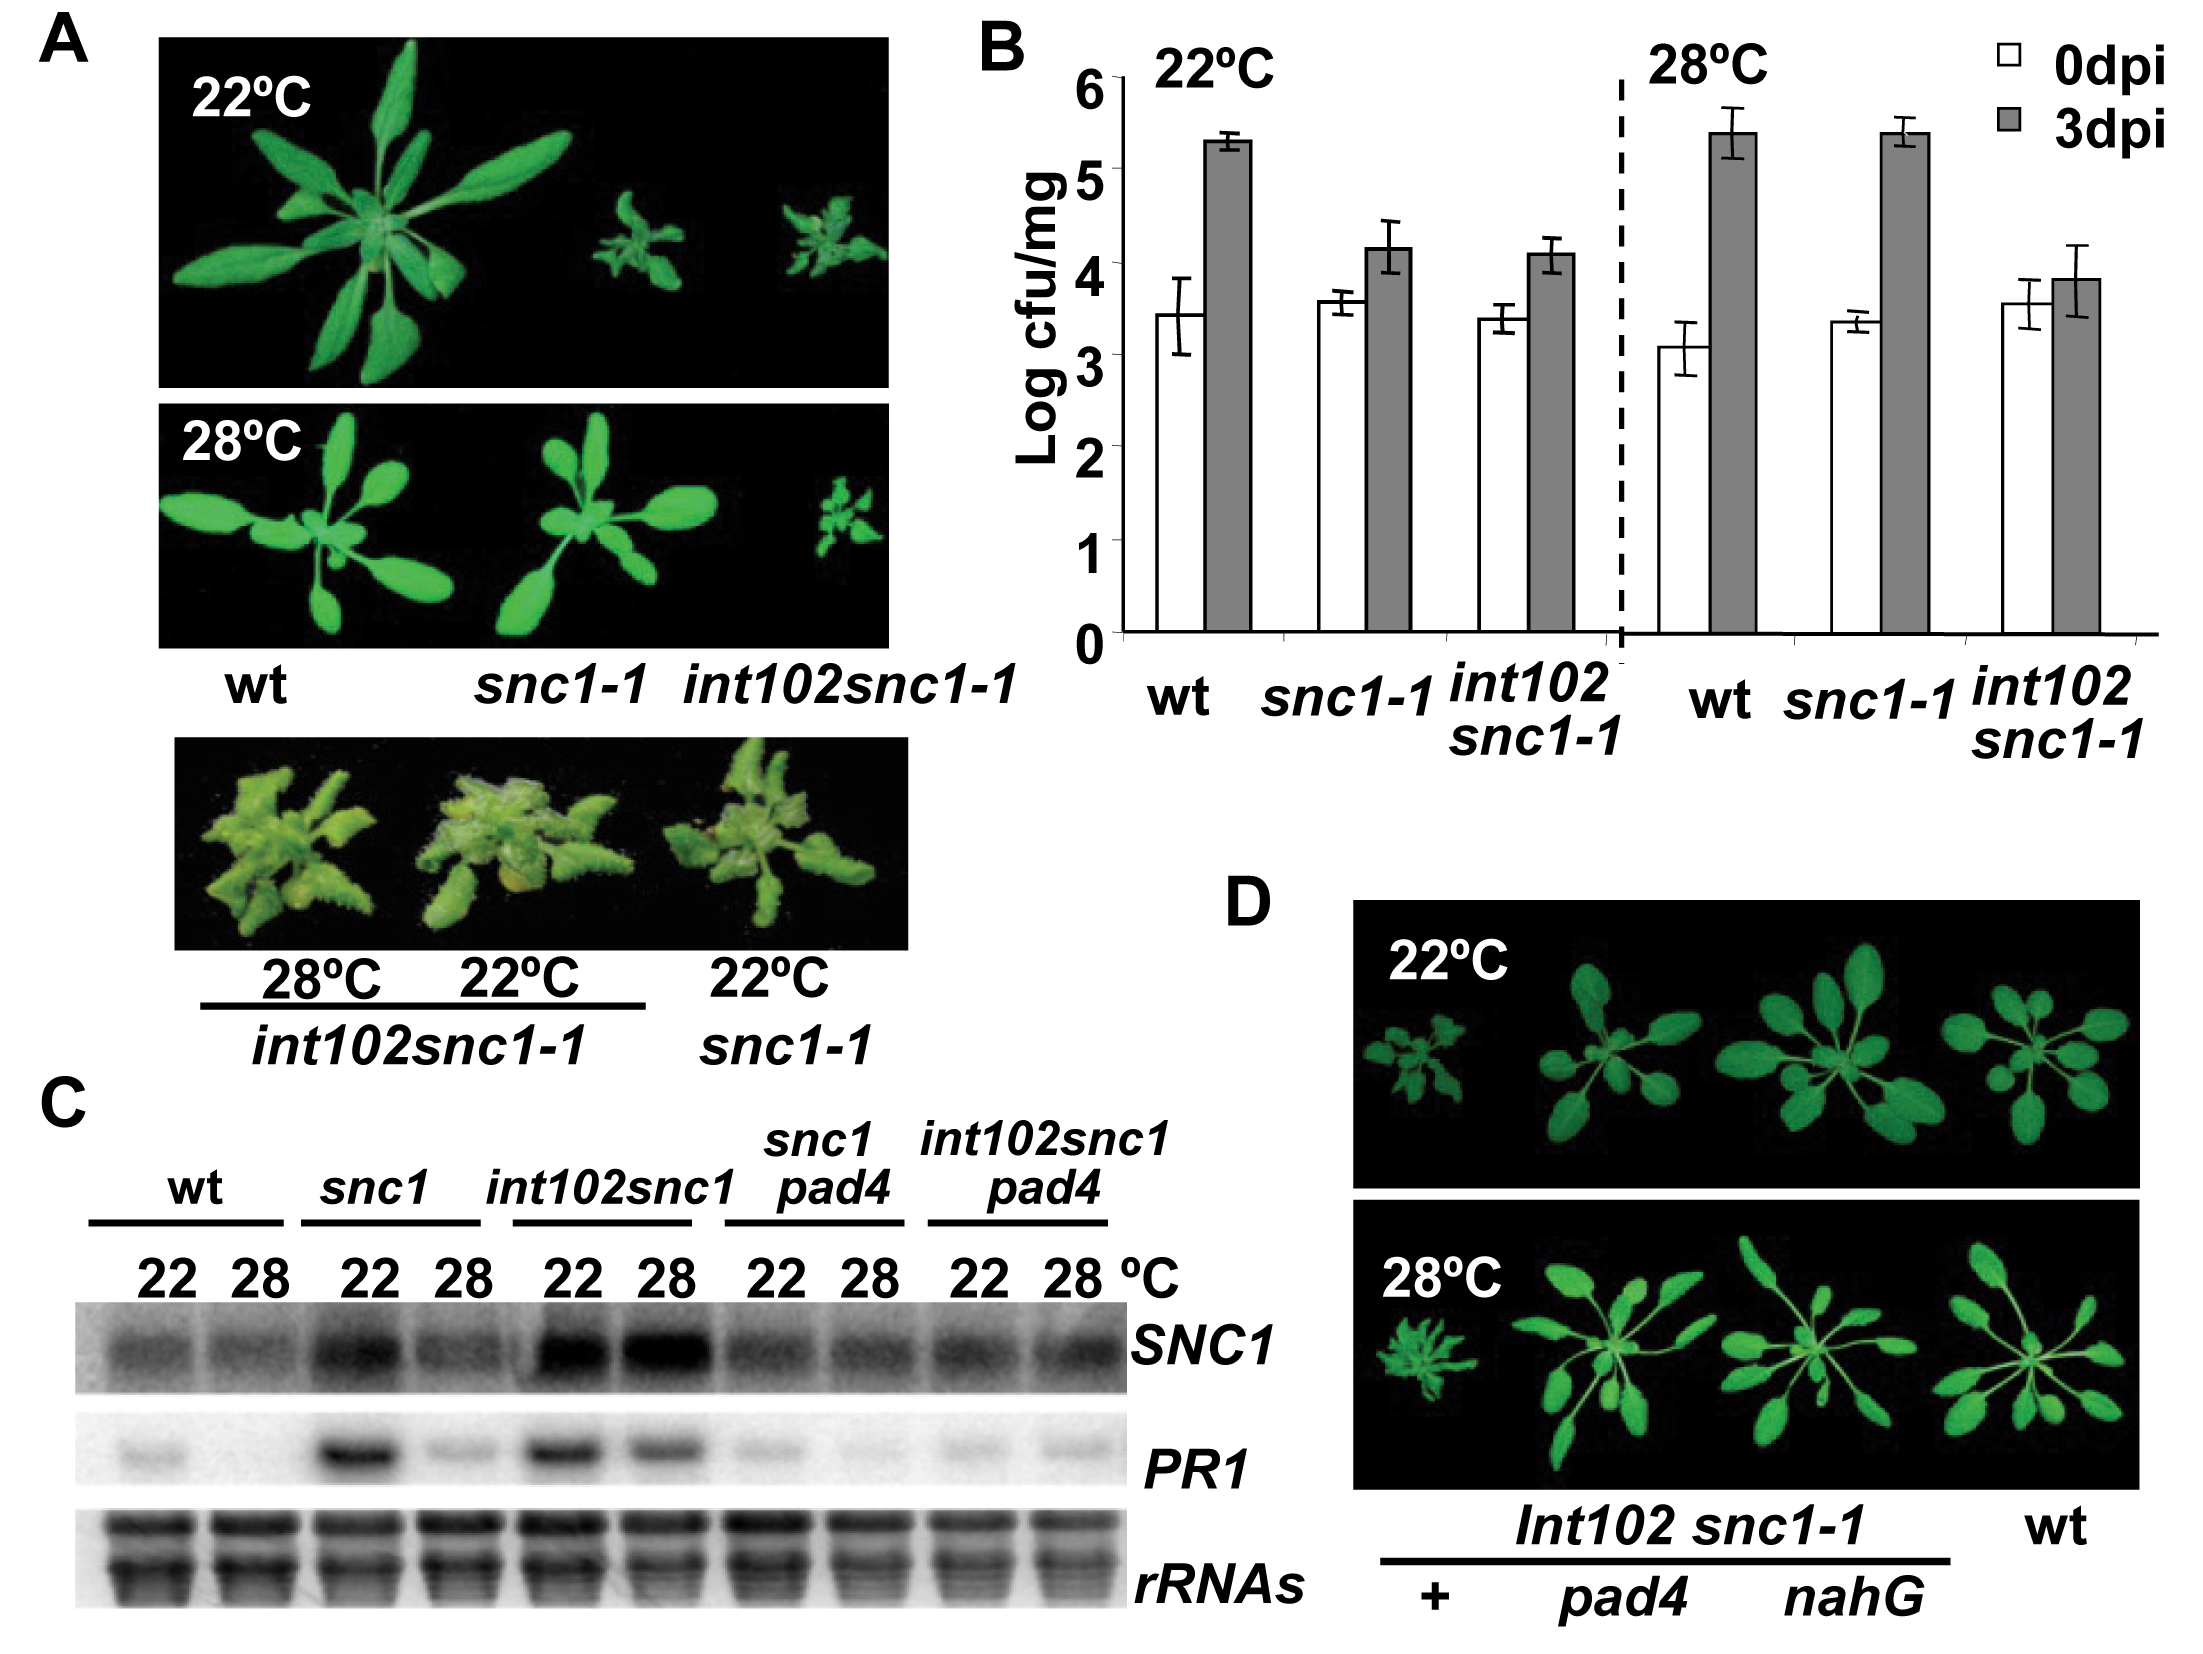 The <i>int102snc1-1</i> mutant has enhanced disease resistance at a high temperature.